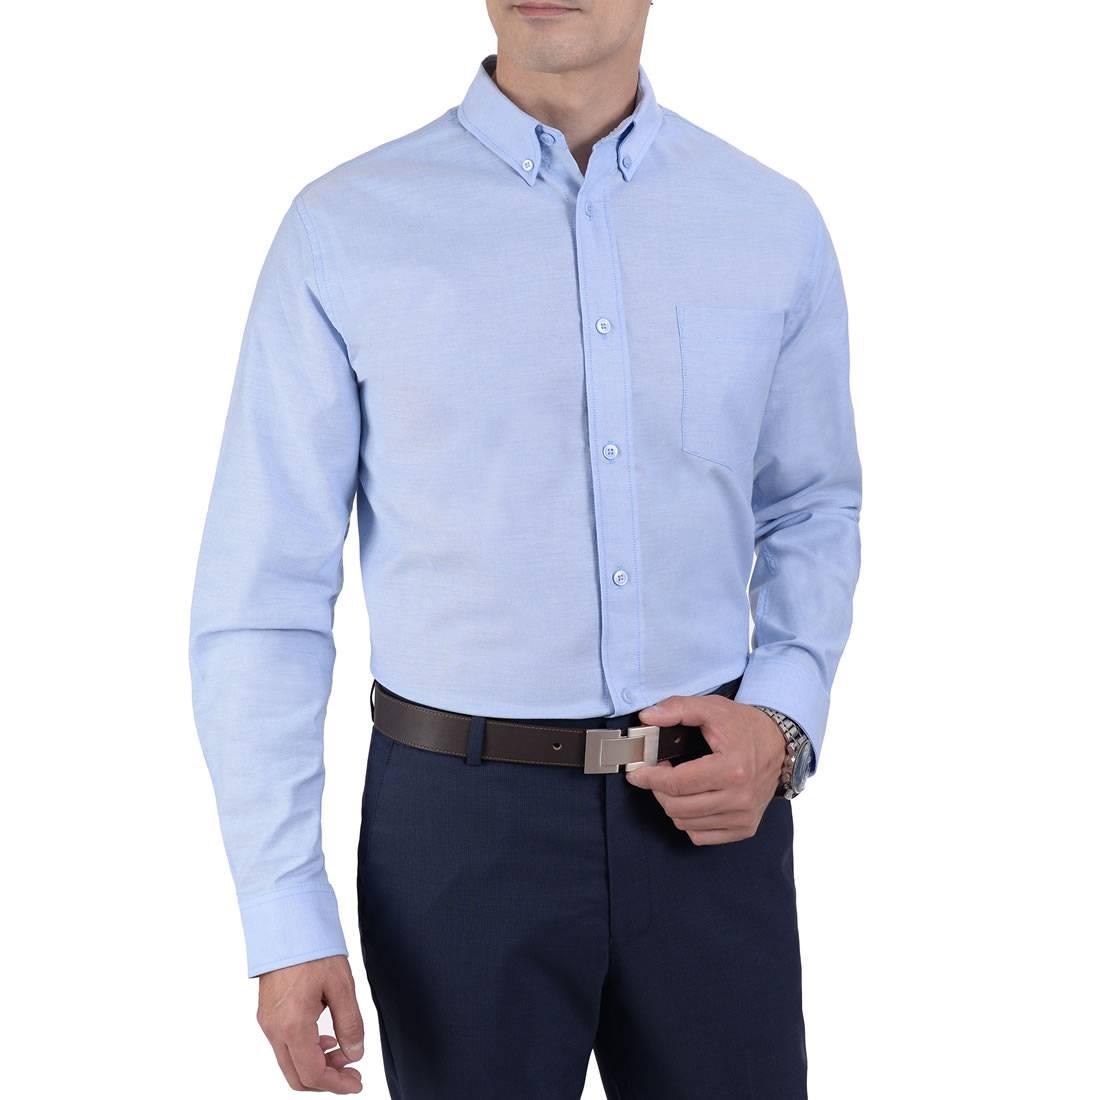 041894321611-01-Camisa-Manga-Larga-Tela-Oxford-Classic-Fit-Azul-Cielo-yale